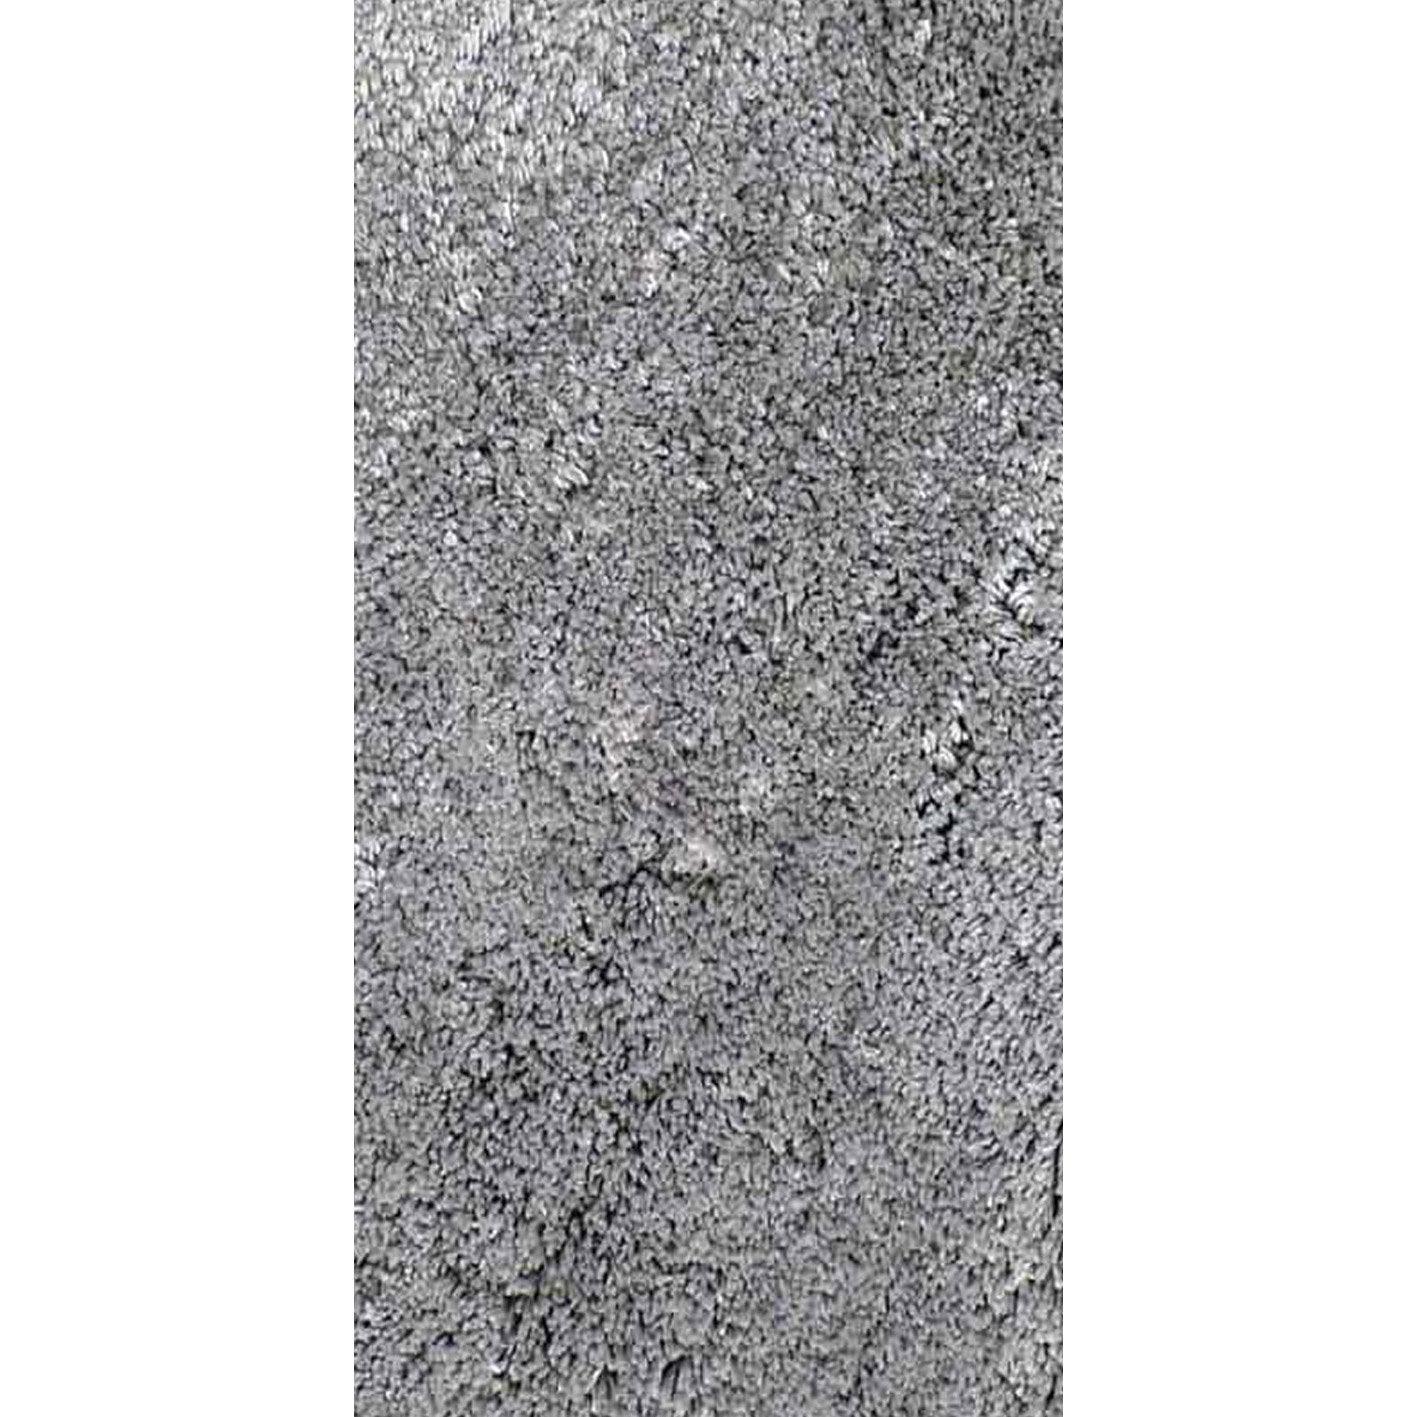 Tapis shaggy agathe gris galet n 4 120x60 cm leroy merlin - Tapis barbecue leroy merlin ...